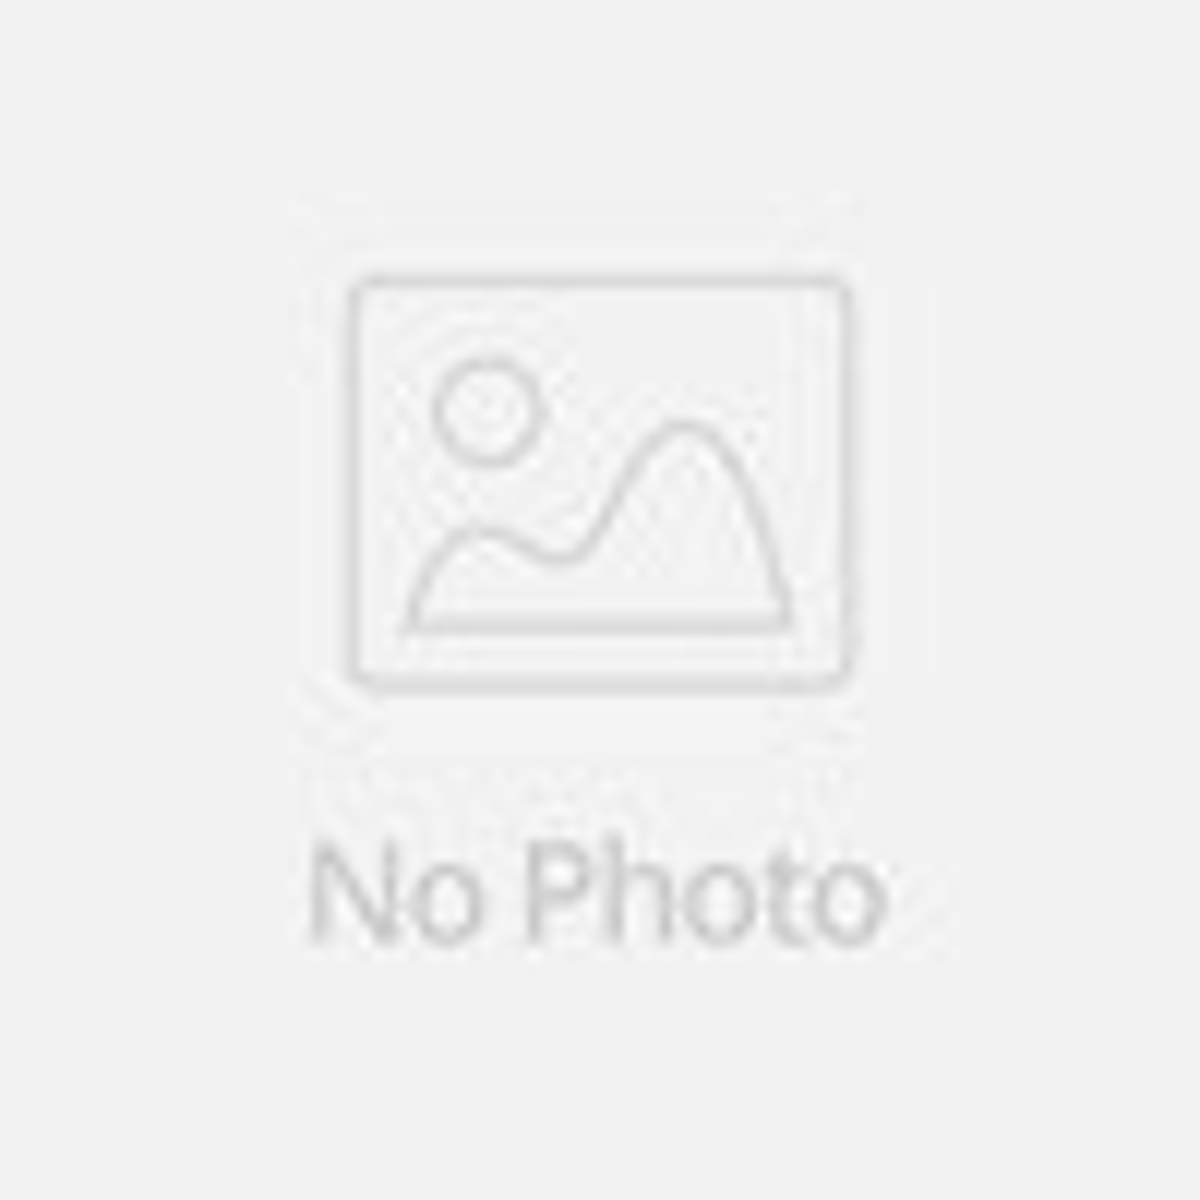 12V Digital Car Battery Analyzer Check Cold Cranking Amps CCA Volts(China (Mainland))